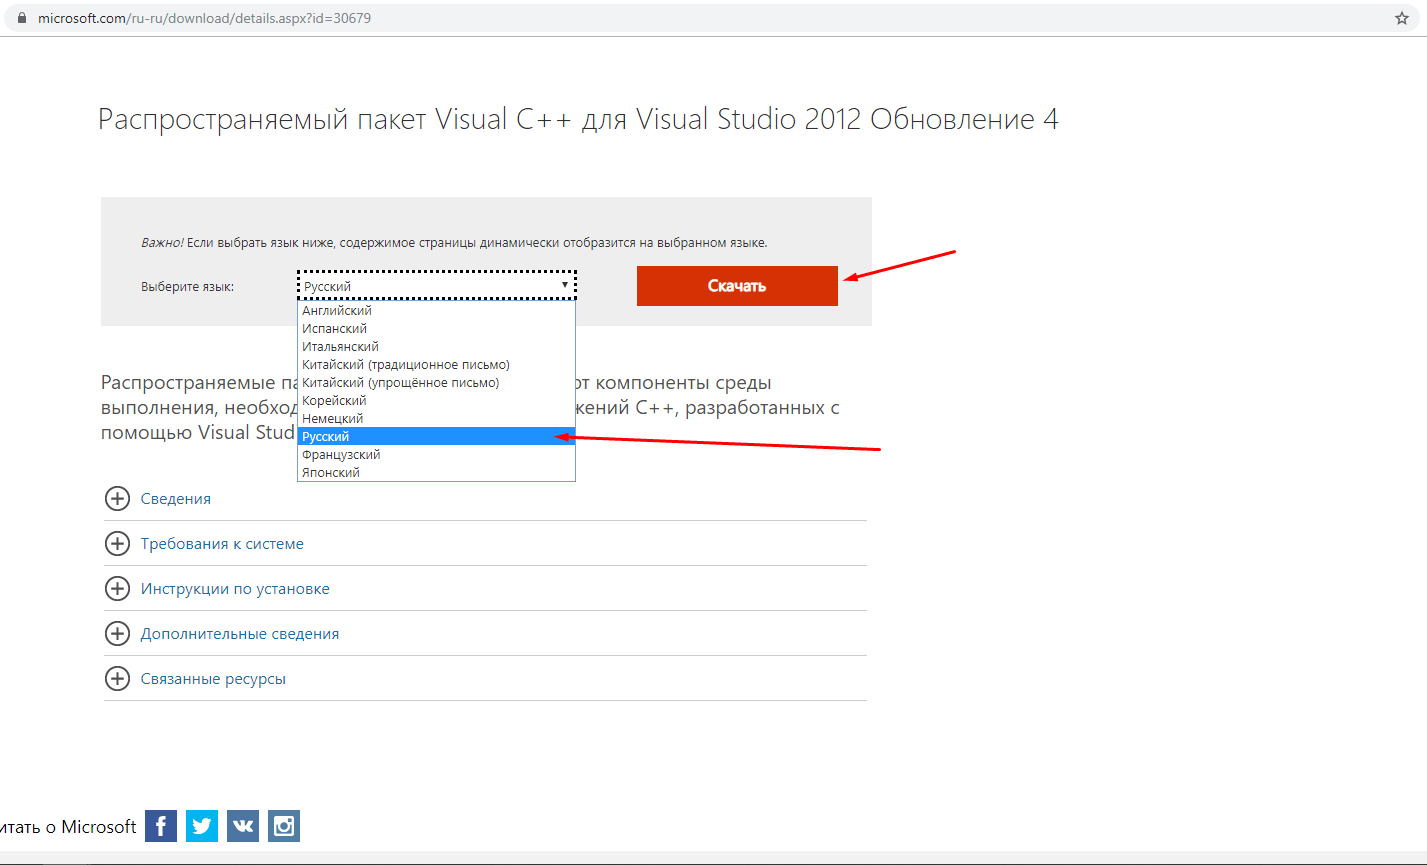 Скачивание пакета Microsoft Visual C++ 2012 для устранения ошибки с файлом vcomp110.dll